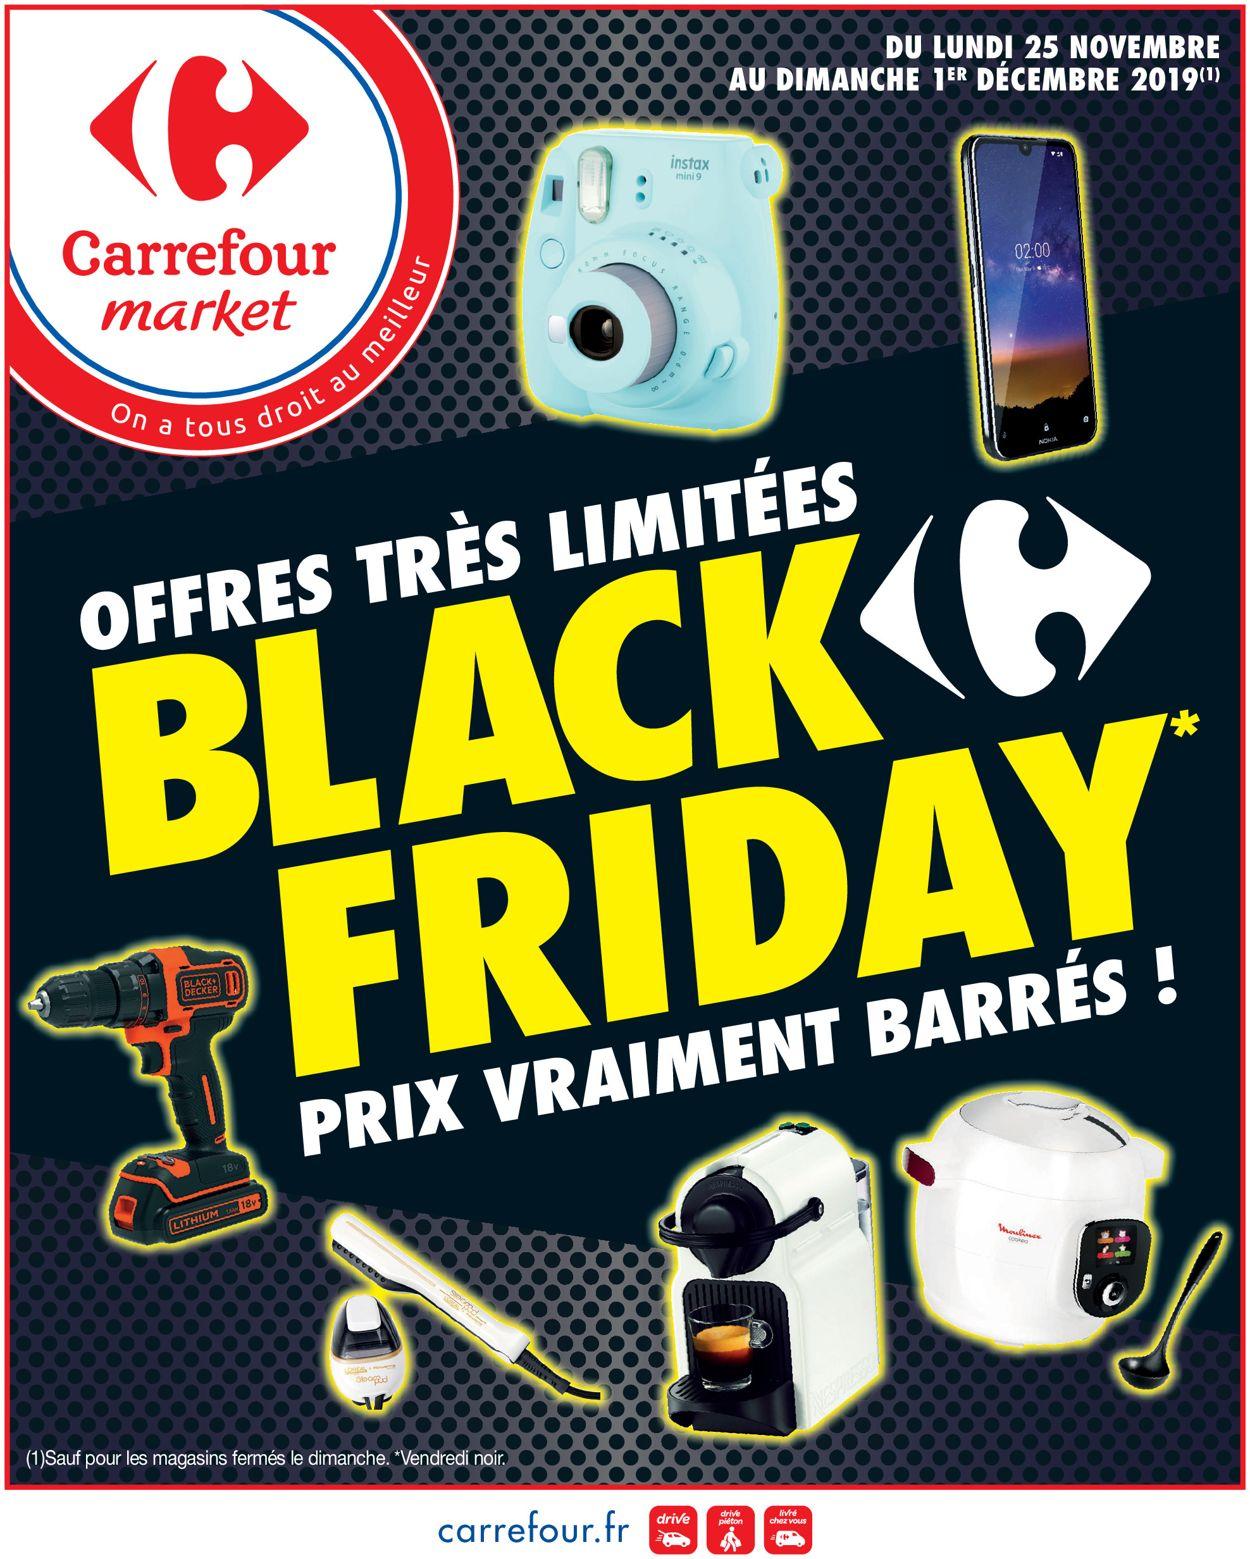 Carrefour BLACK FRIDAY 2019 Catalogue - 25.11-01.12.2019